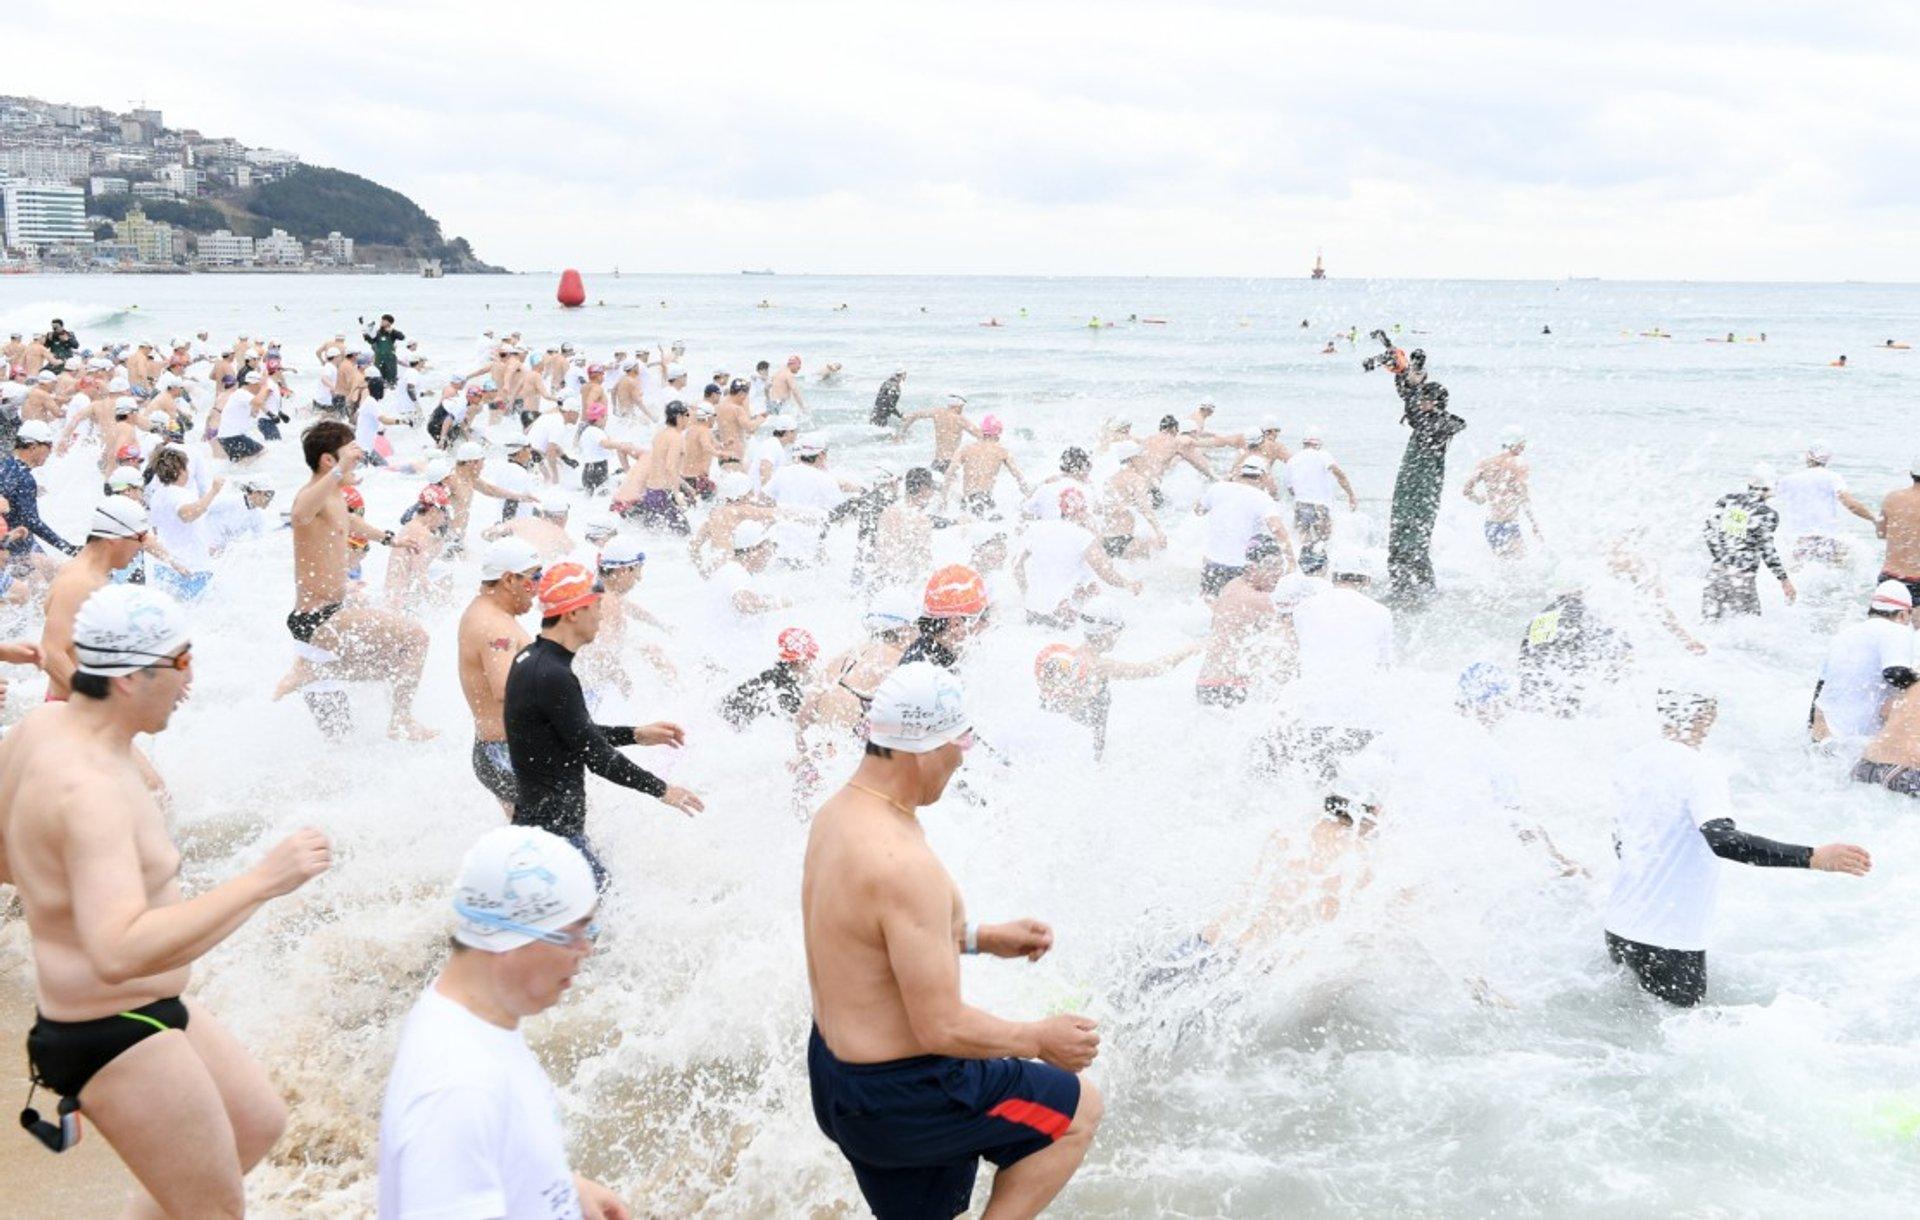 Best time to see Polar Bear Swim Festival in South Korea